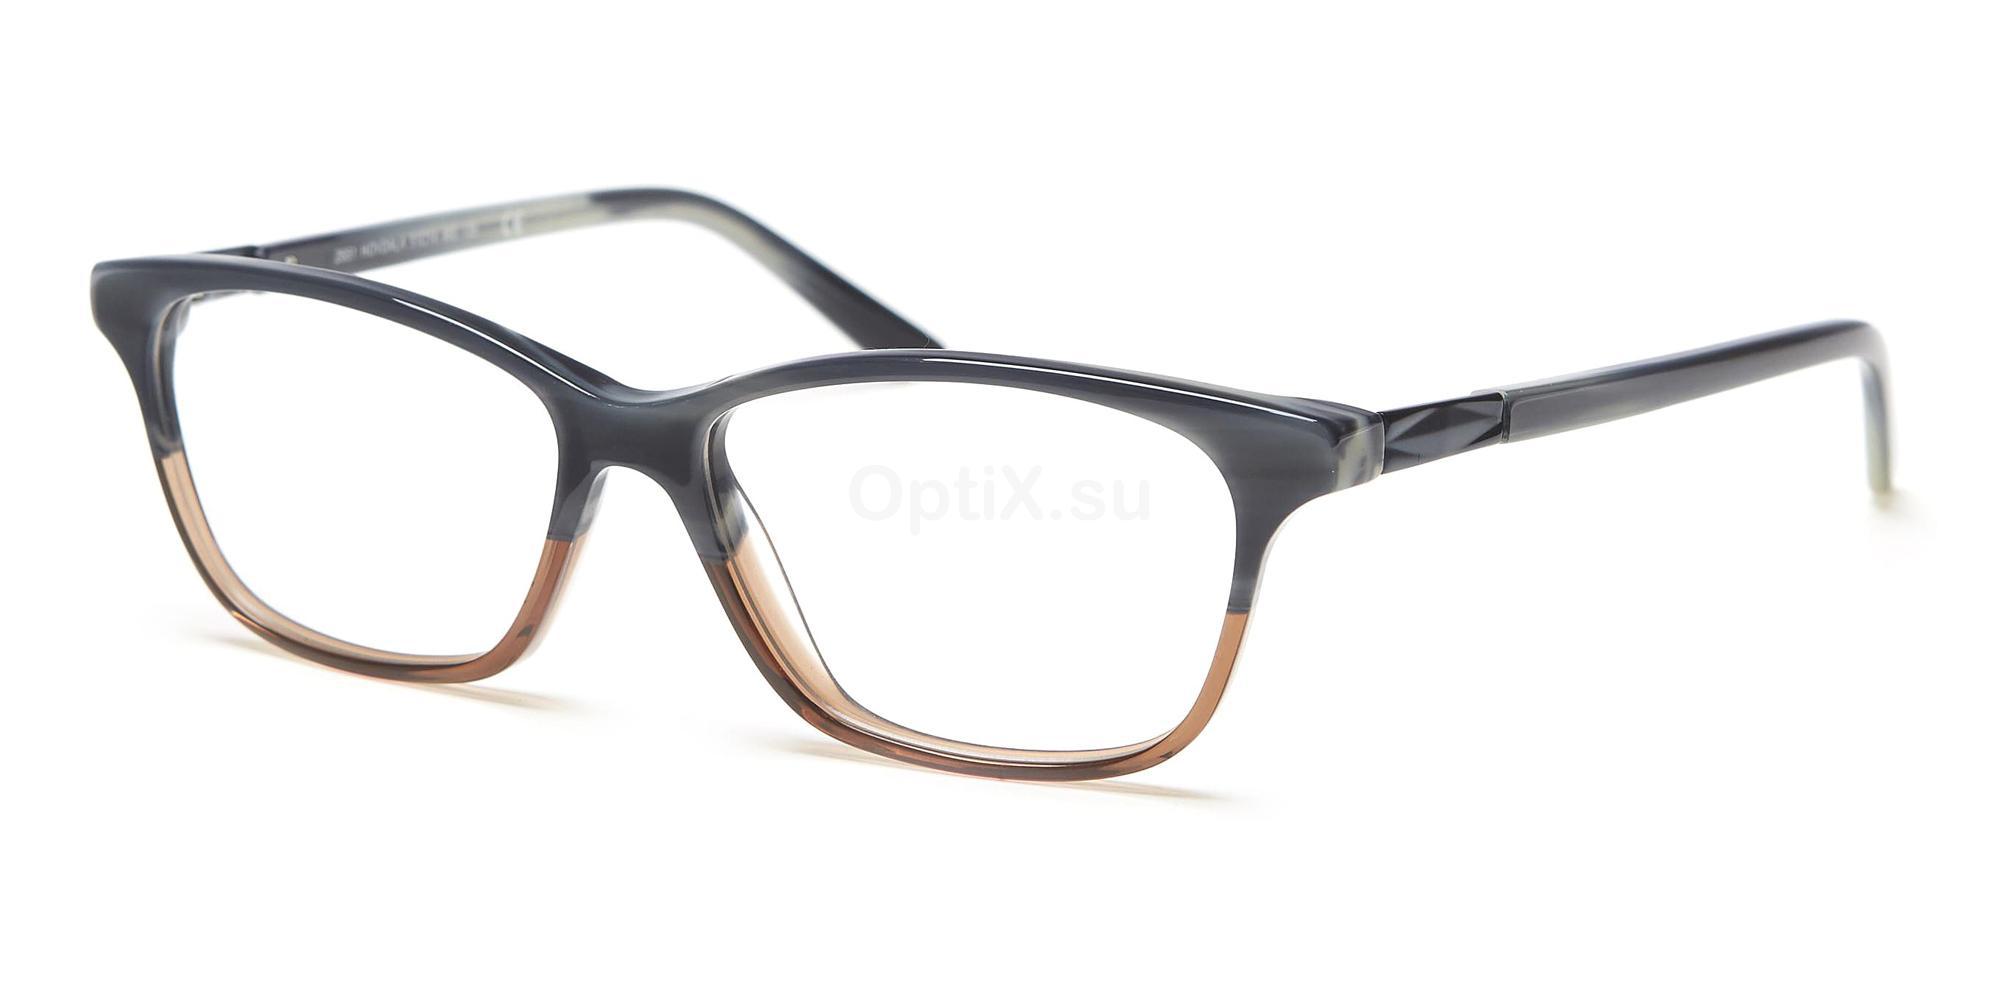 460 SK2651 HOVDALA Glasses, Skaga